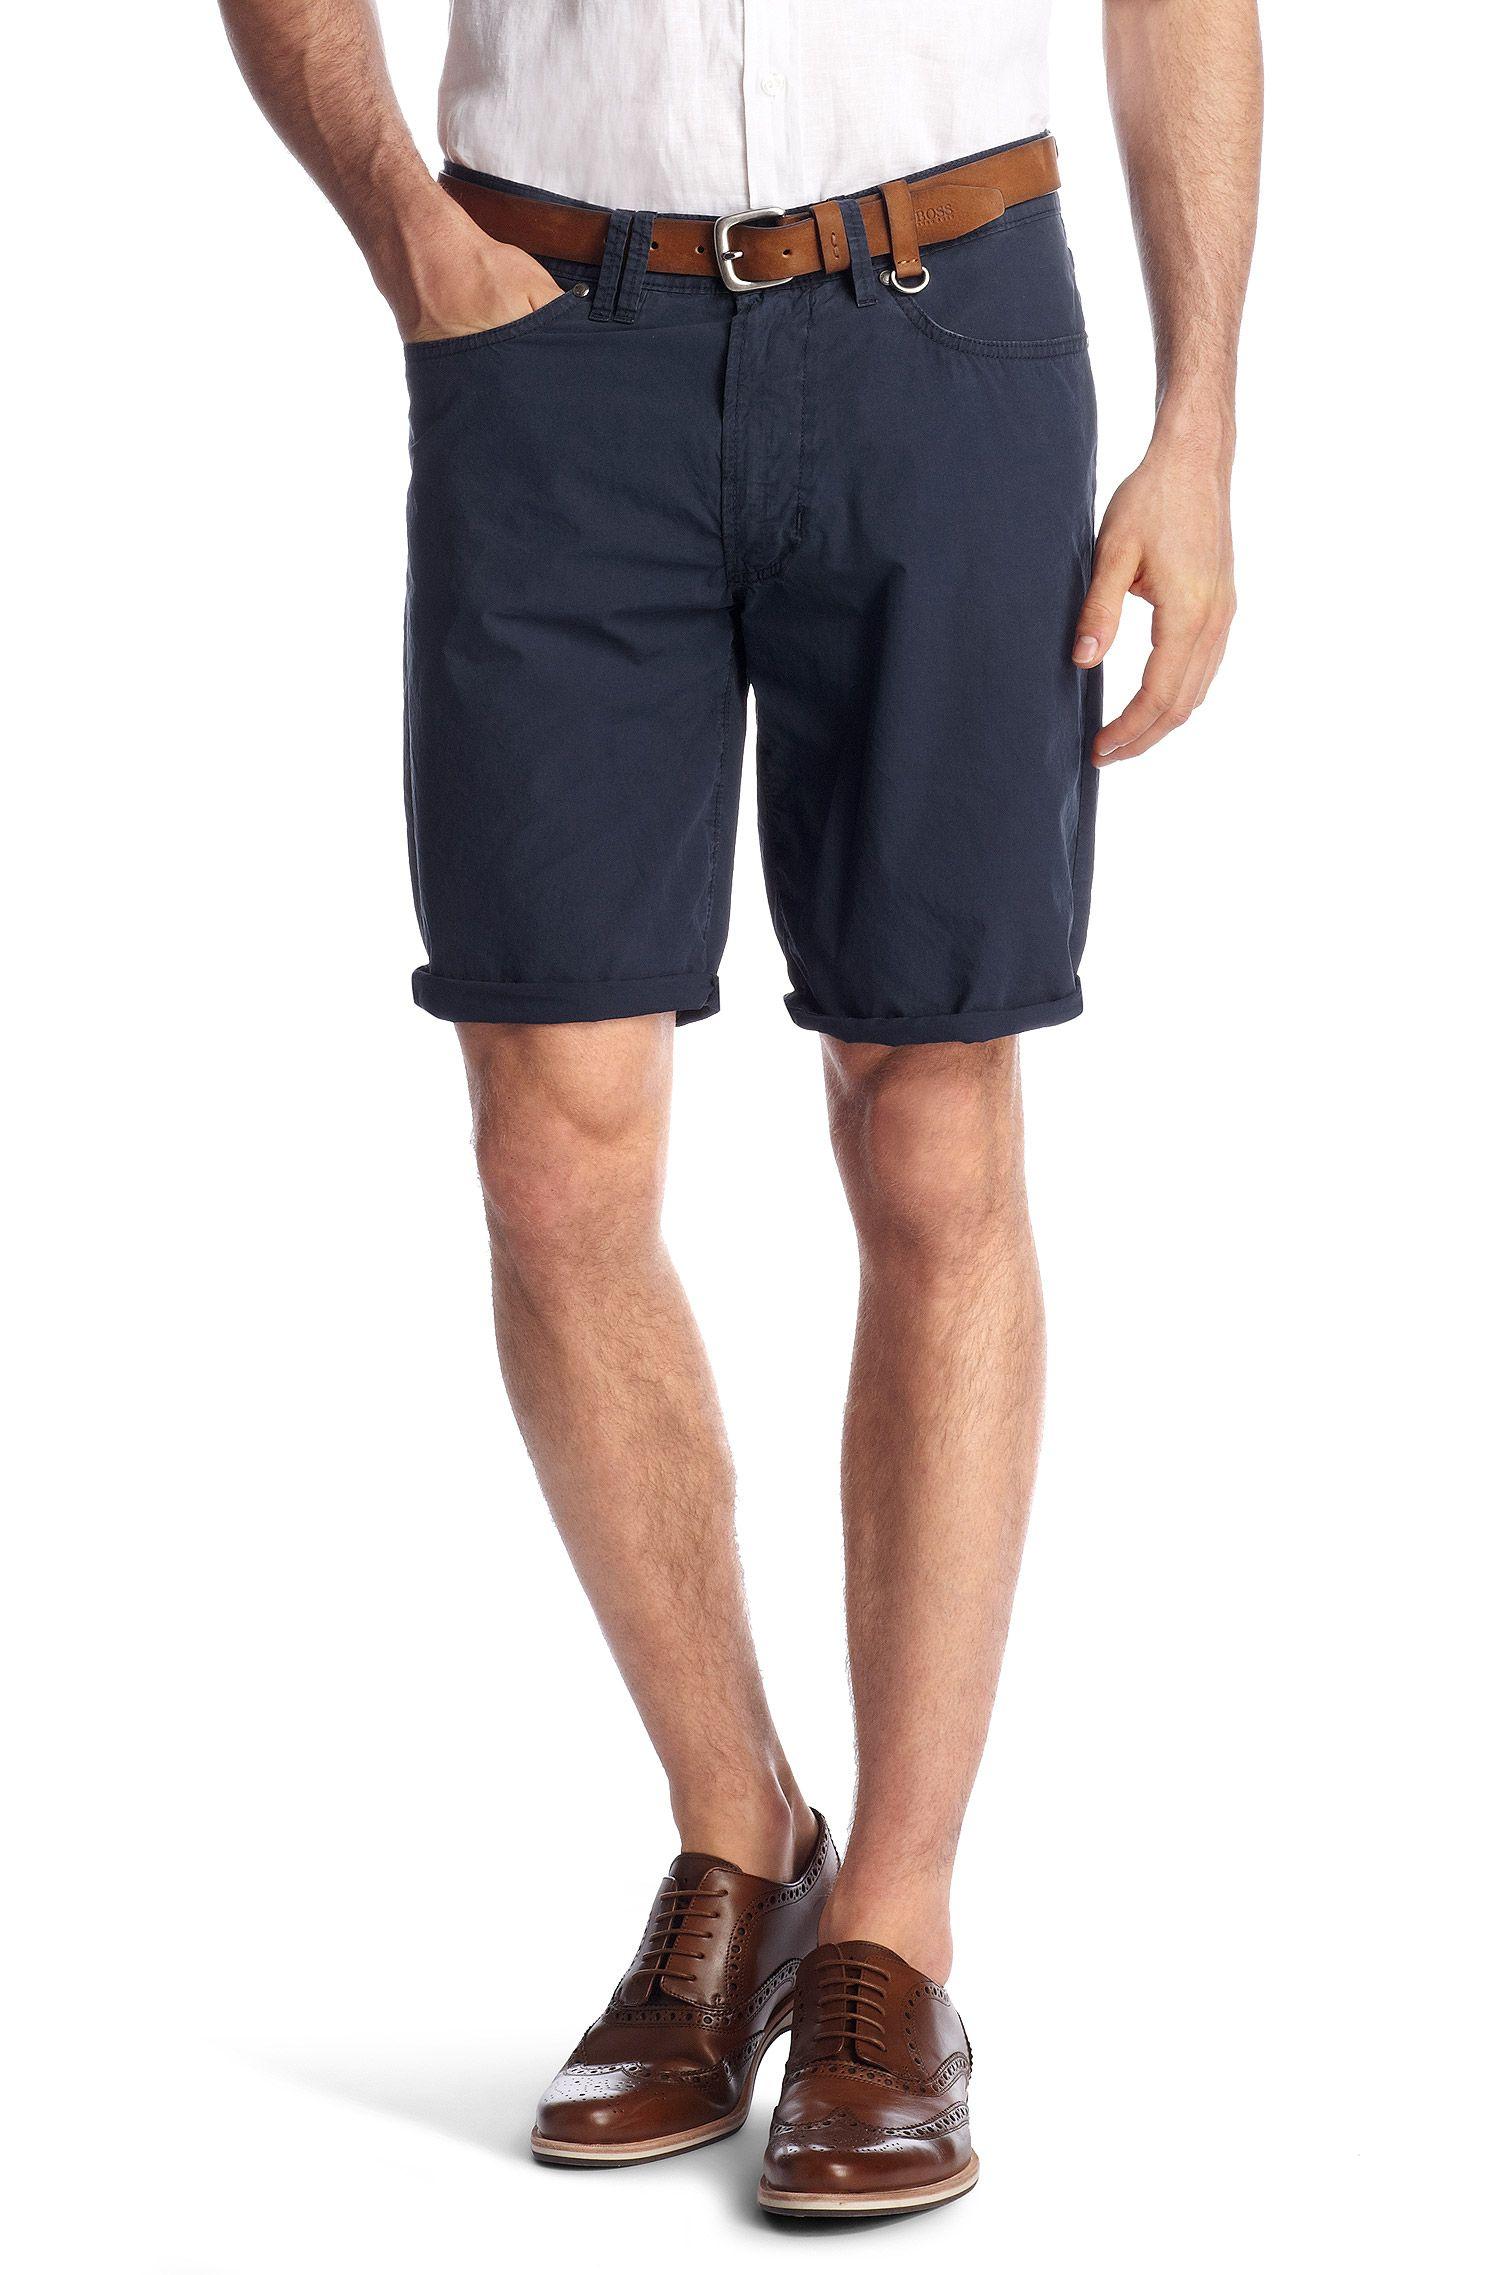 Cargo-Shorts ´Bahamas-10` mit Reißverschluss